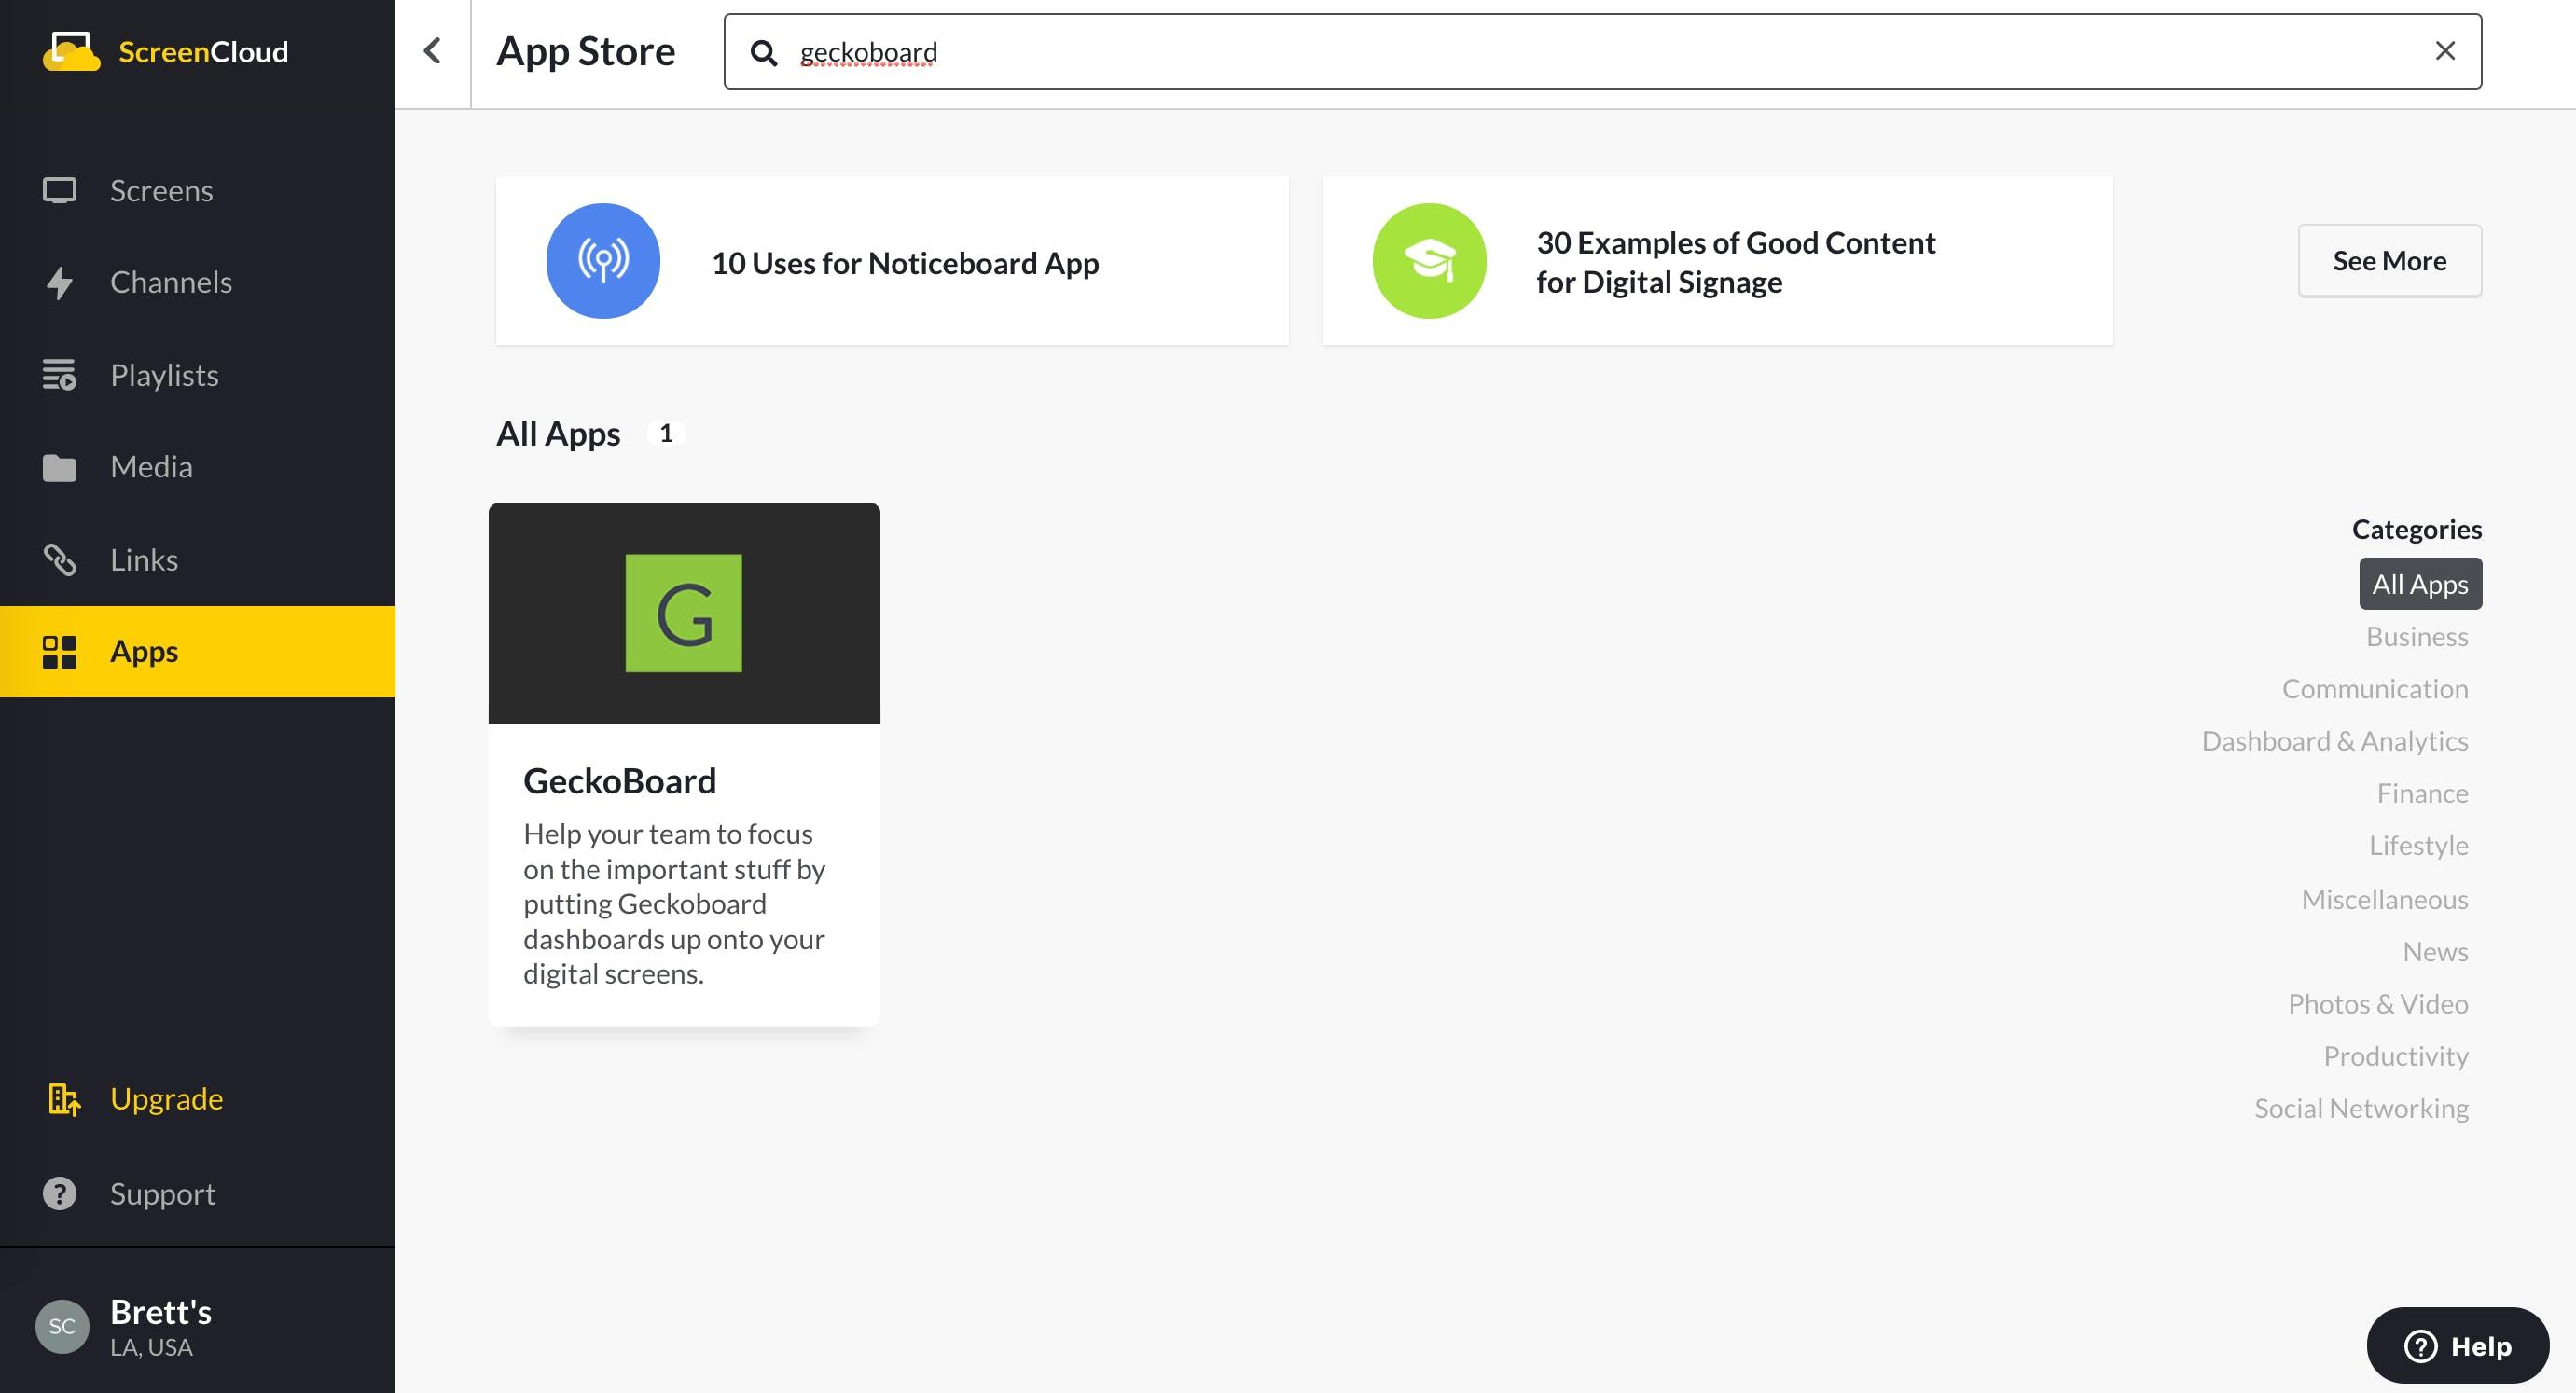 Geckboard App Guide - App Store 5.13.2020.png